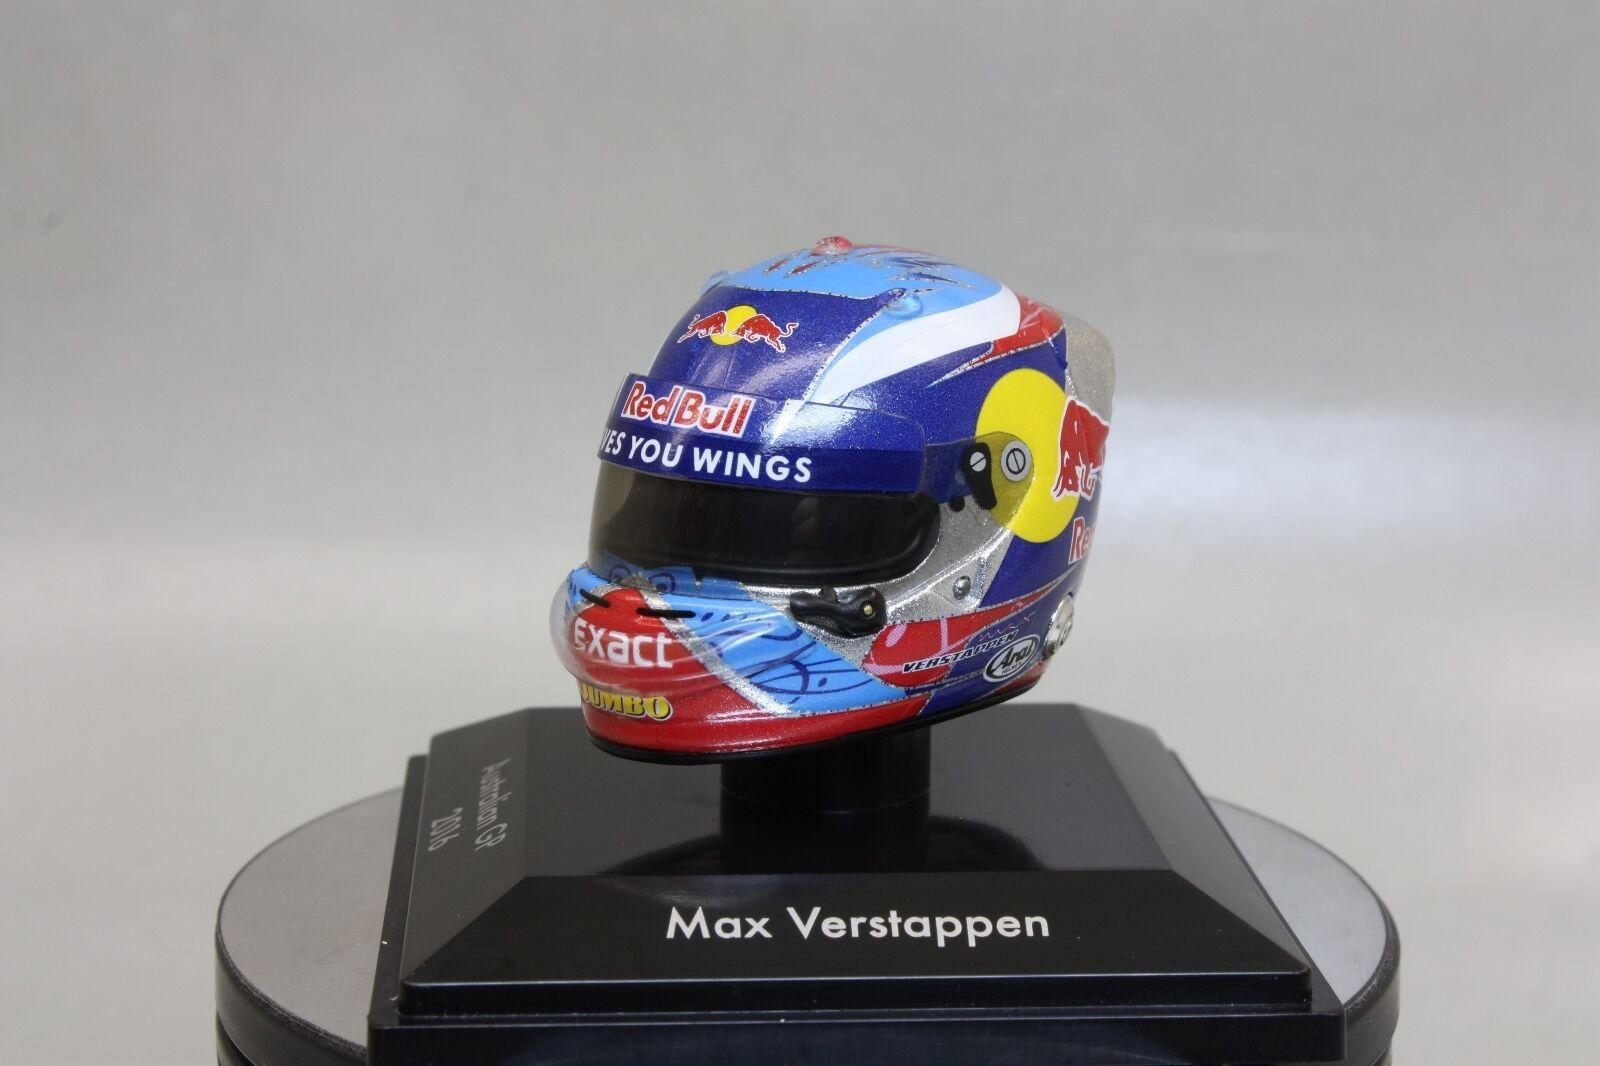 Max Verstappen 1 8 Helmet Australia Grand Prix 2016 Special Edition Tgold red